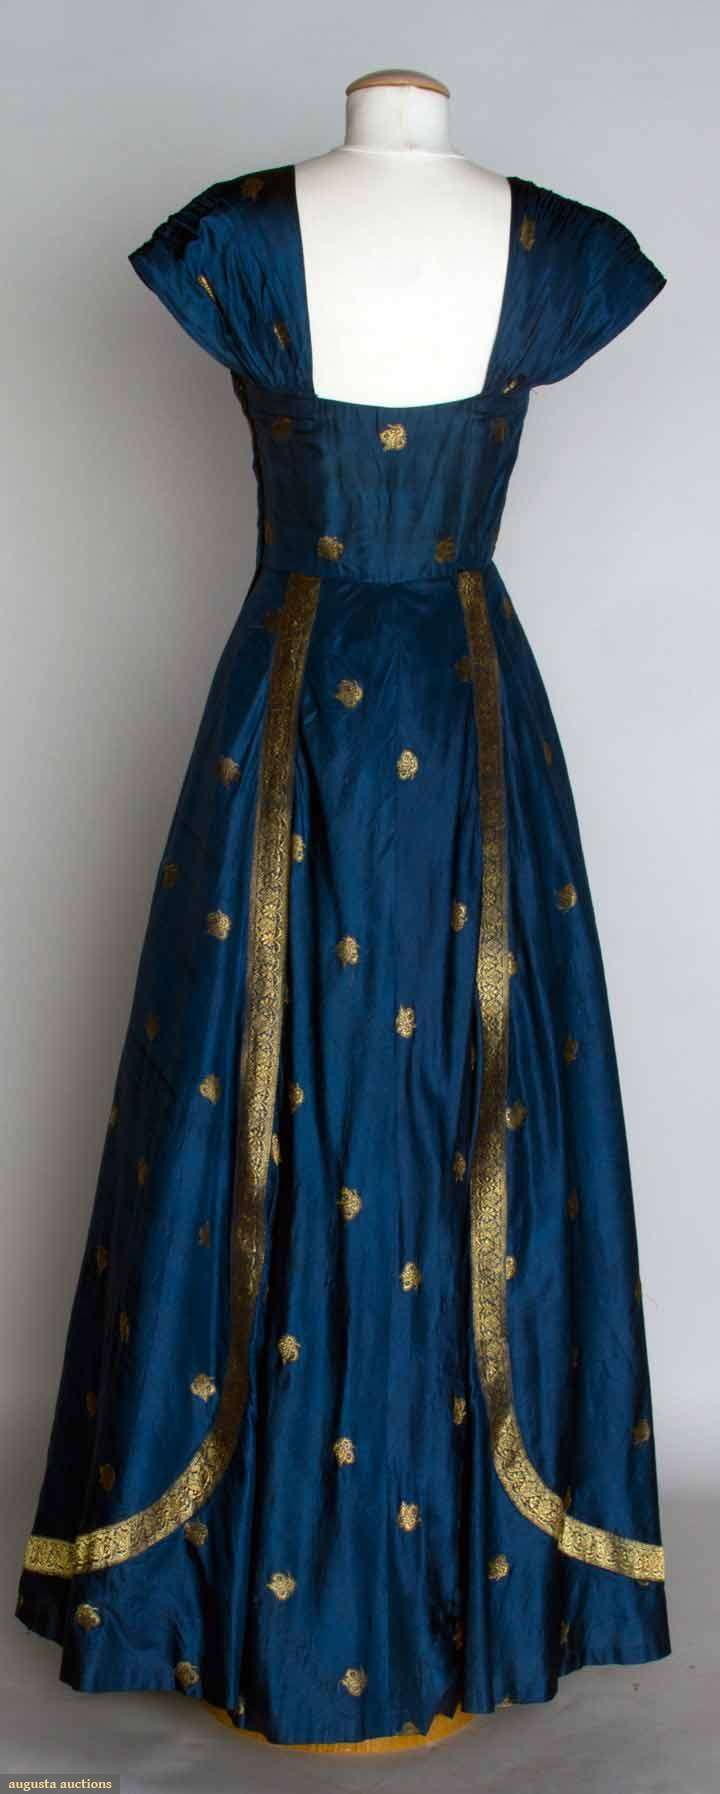 Blue u gold evening dress blue silk taffeta w metallic gold